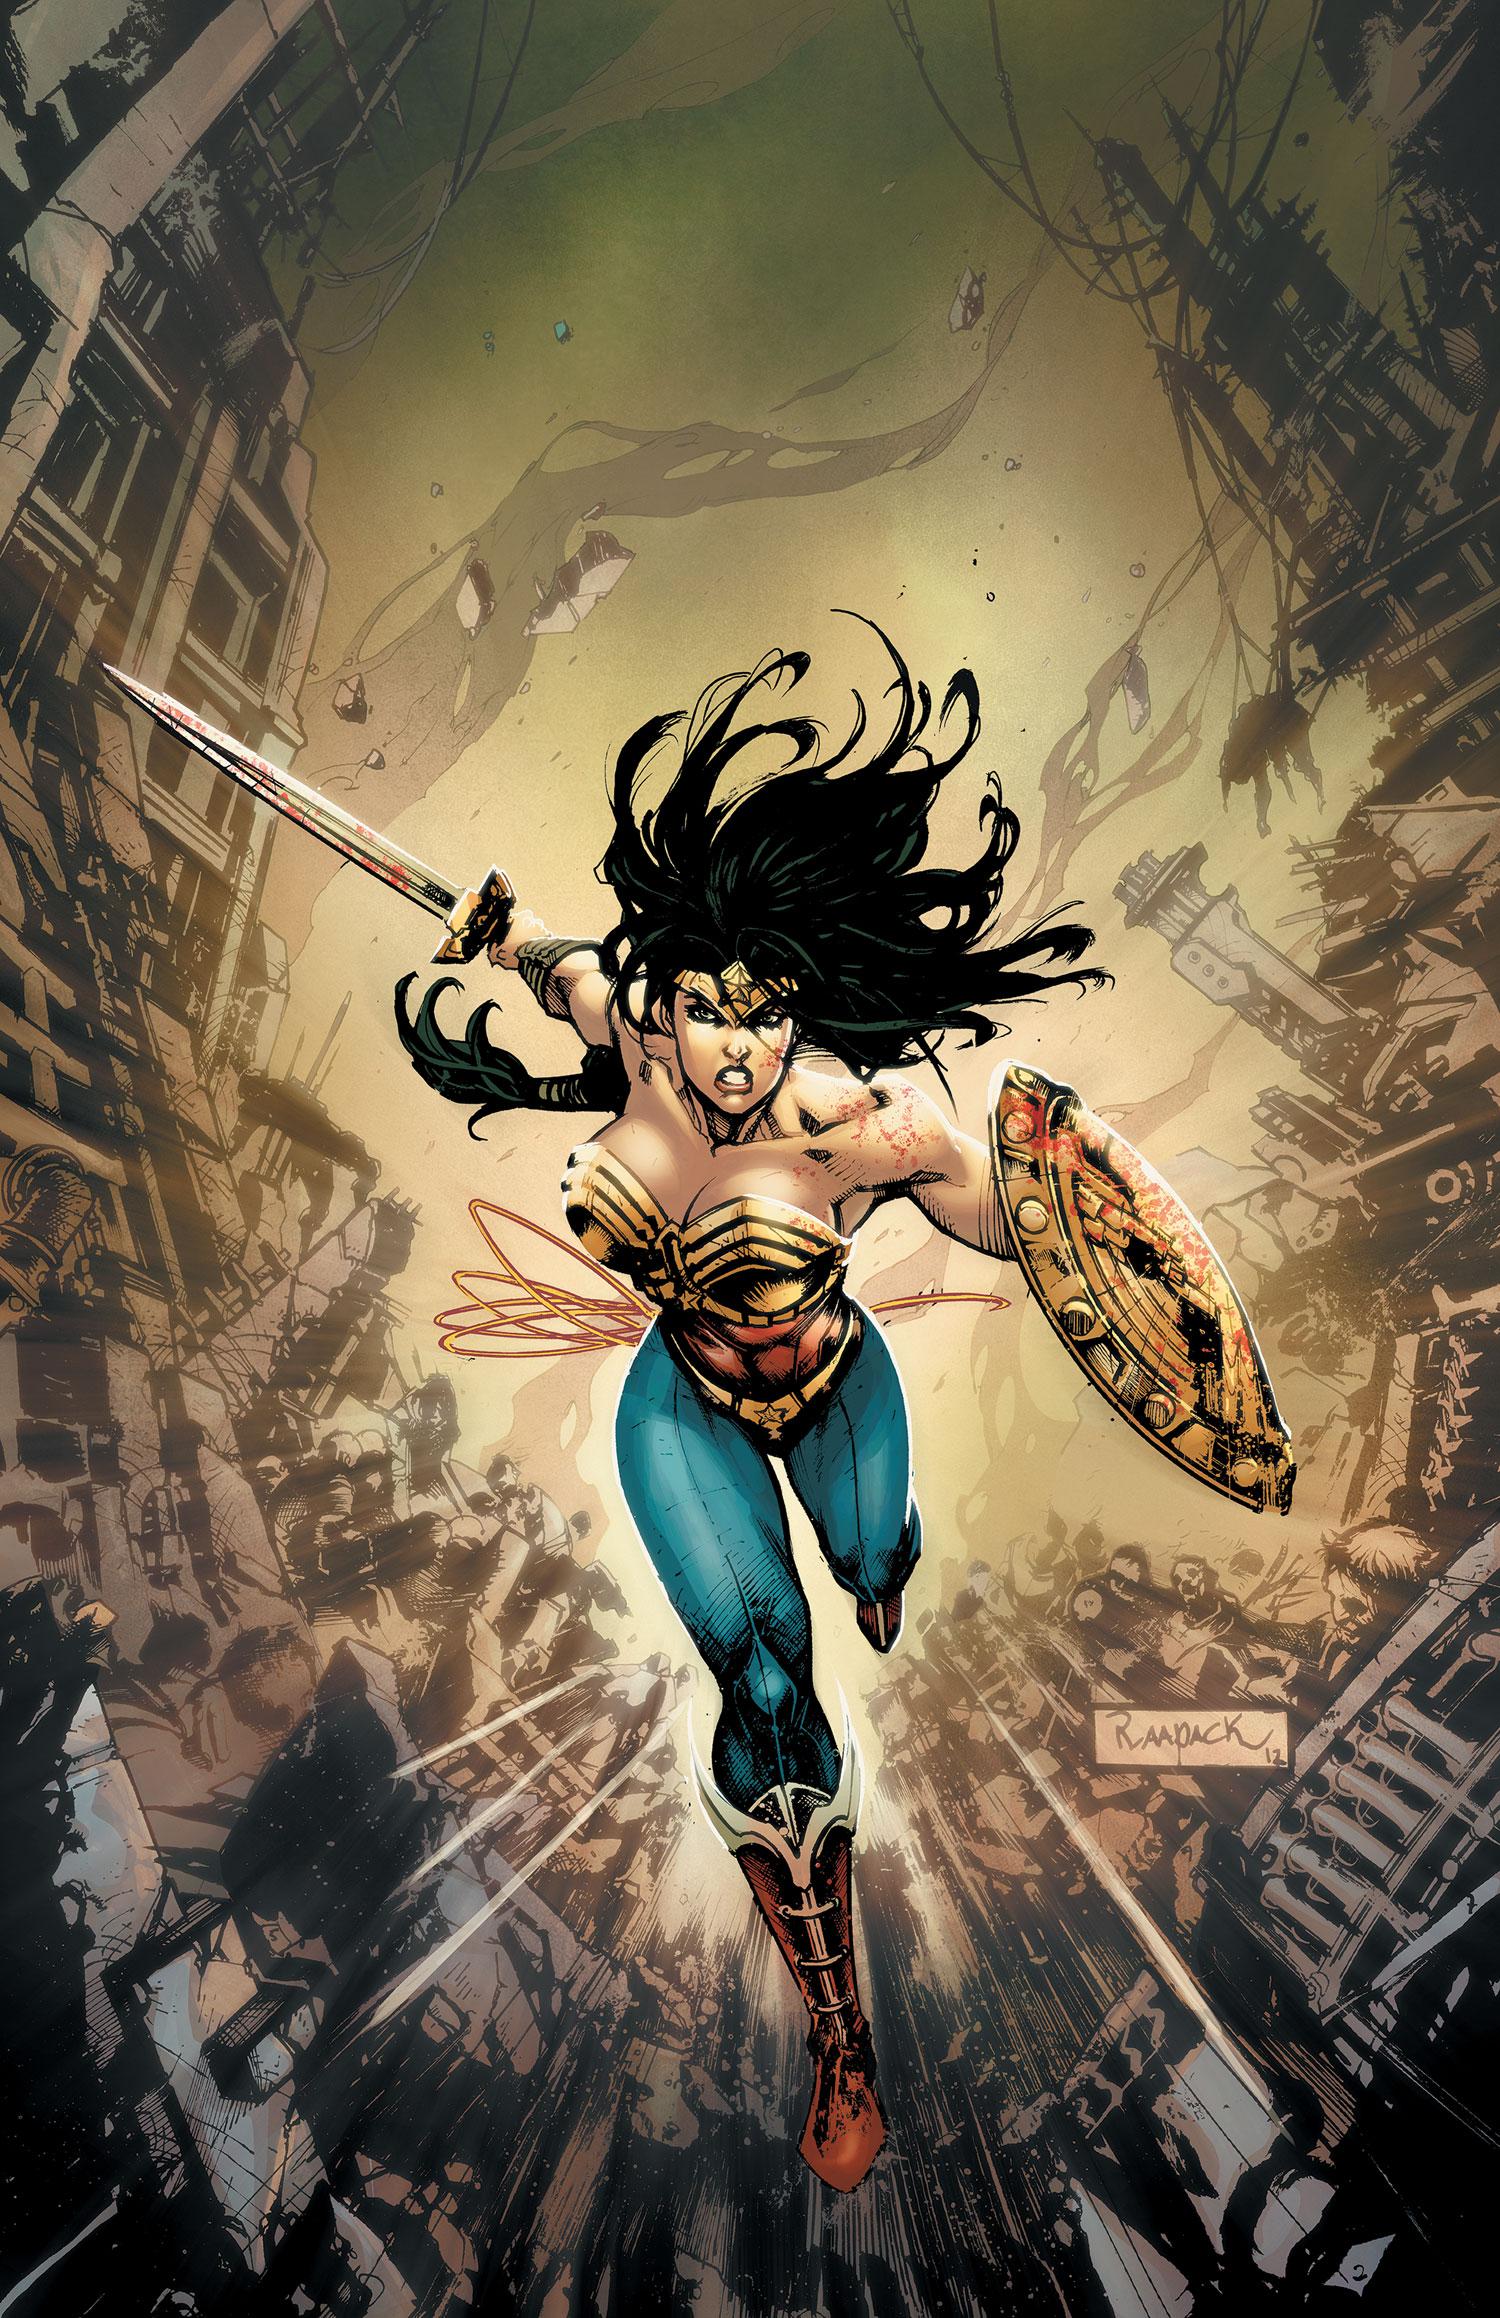 Injustice: Gods Among Us Vol 1 3 | DC Database | FANDOM